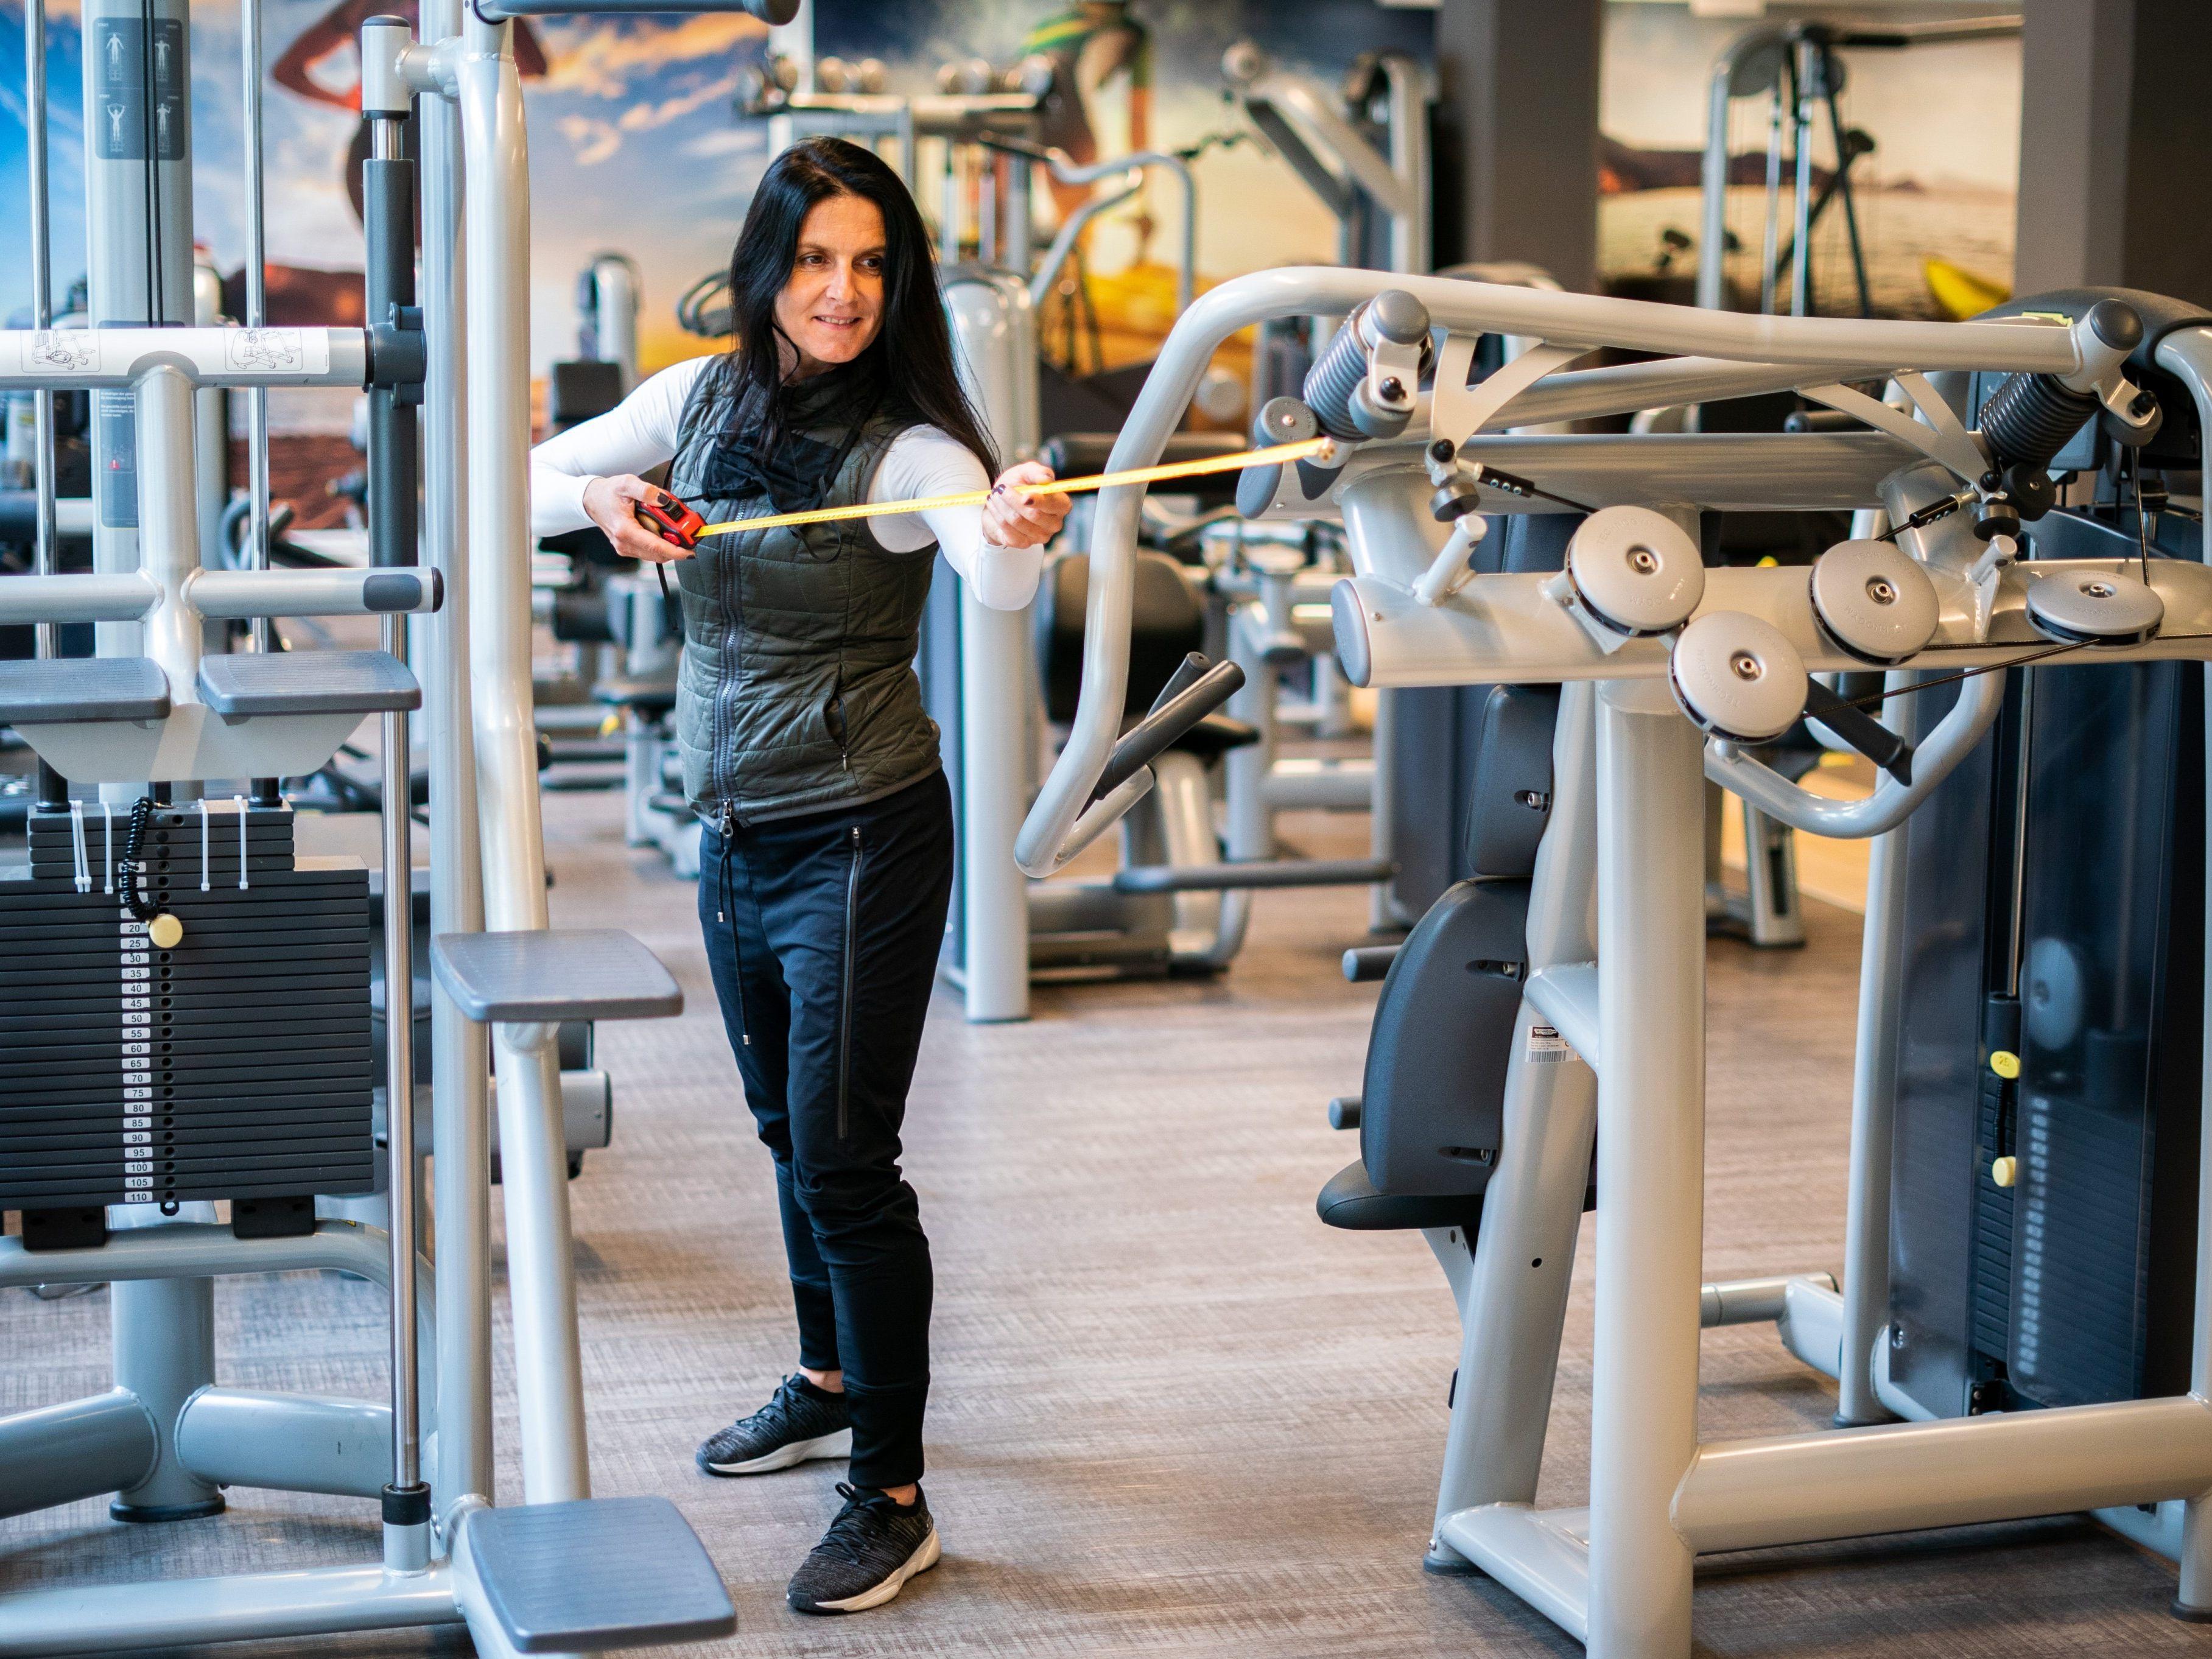 Wiener Fitnessstudios Bei Wiederoffnung Gut Besucht Coronavirus Wien Vienna At